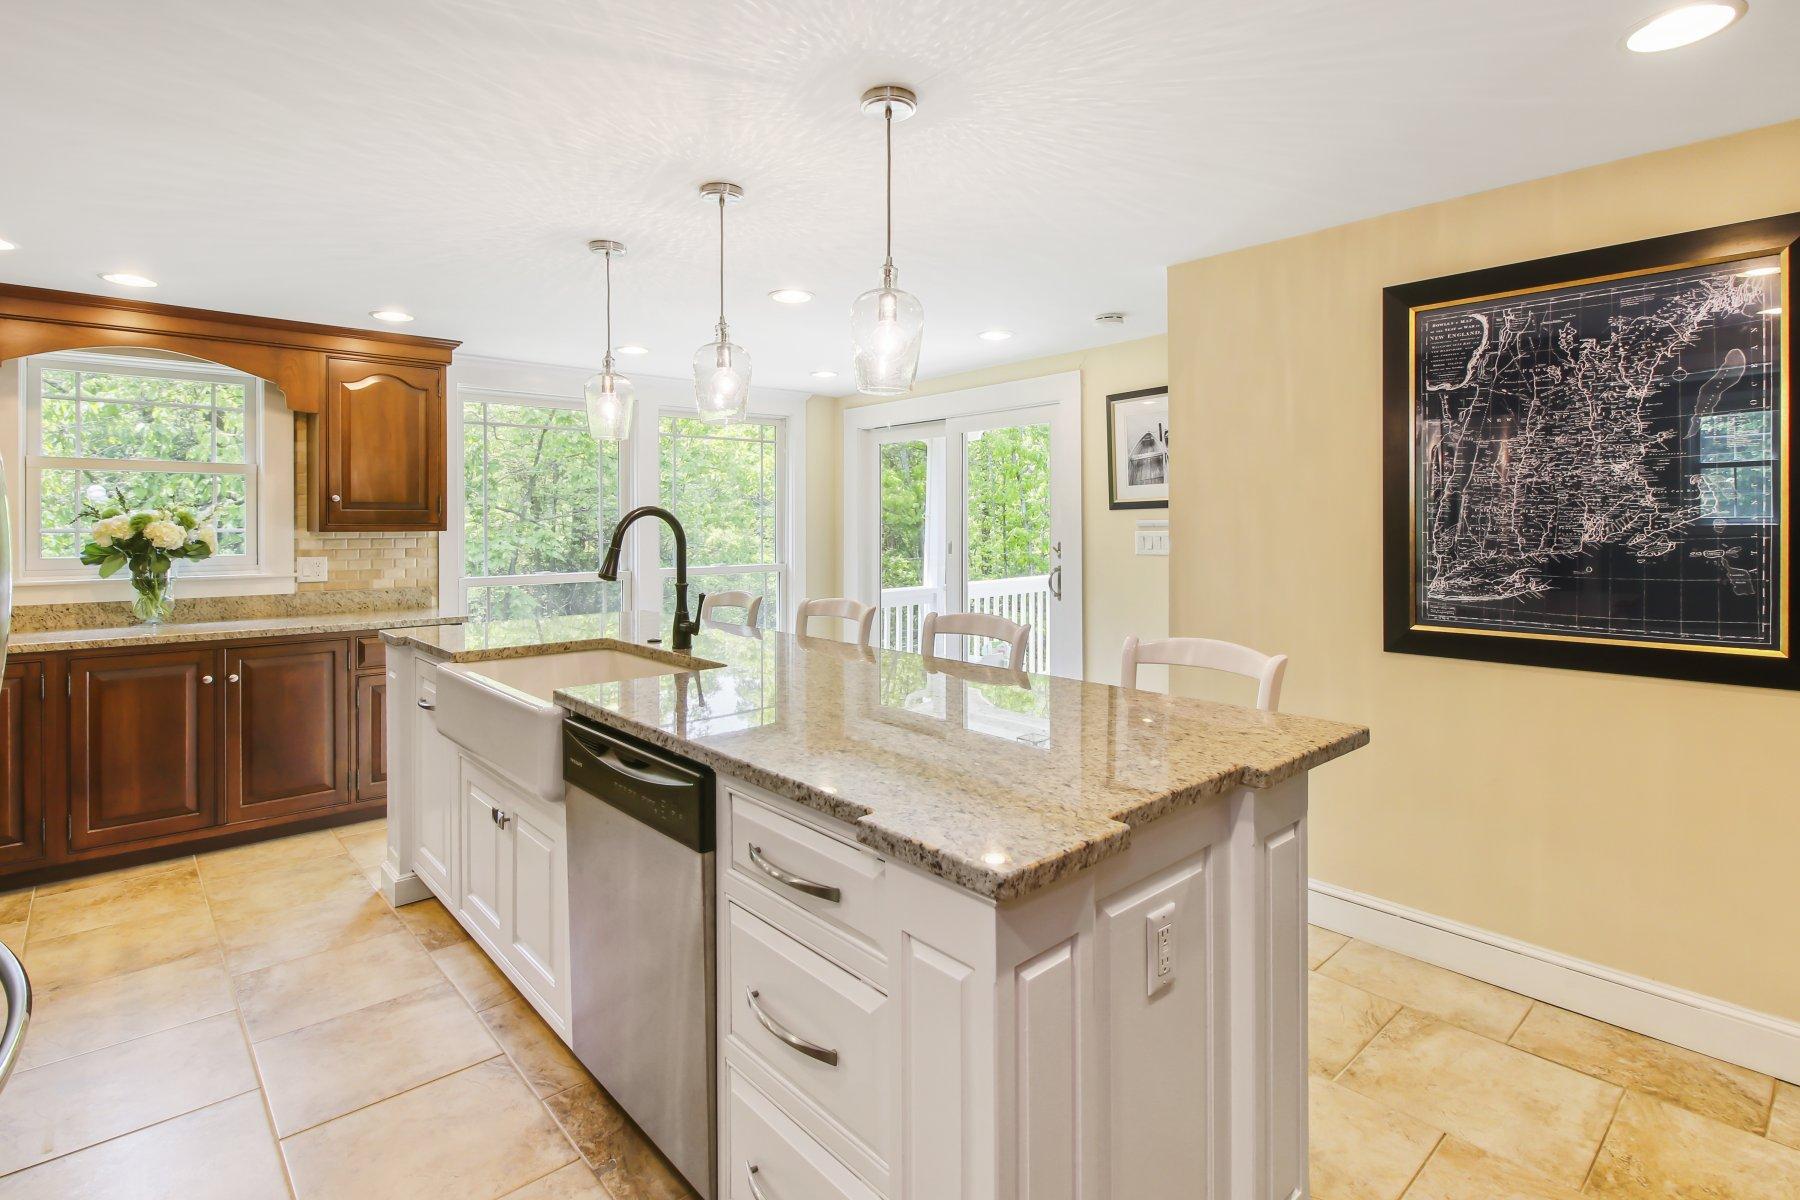 Single Family Homes por un Venta en 30 Bayberry Ln, Cohasset 30 Bayberry Ln Cohasset, Massachusetts 02025 Estados Unidos